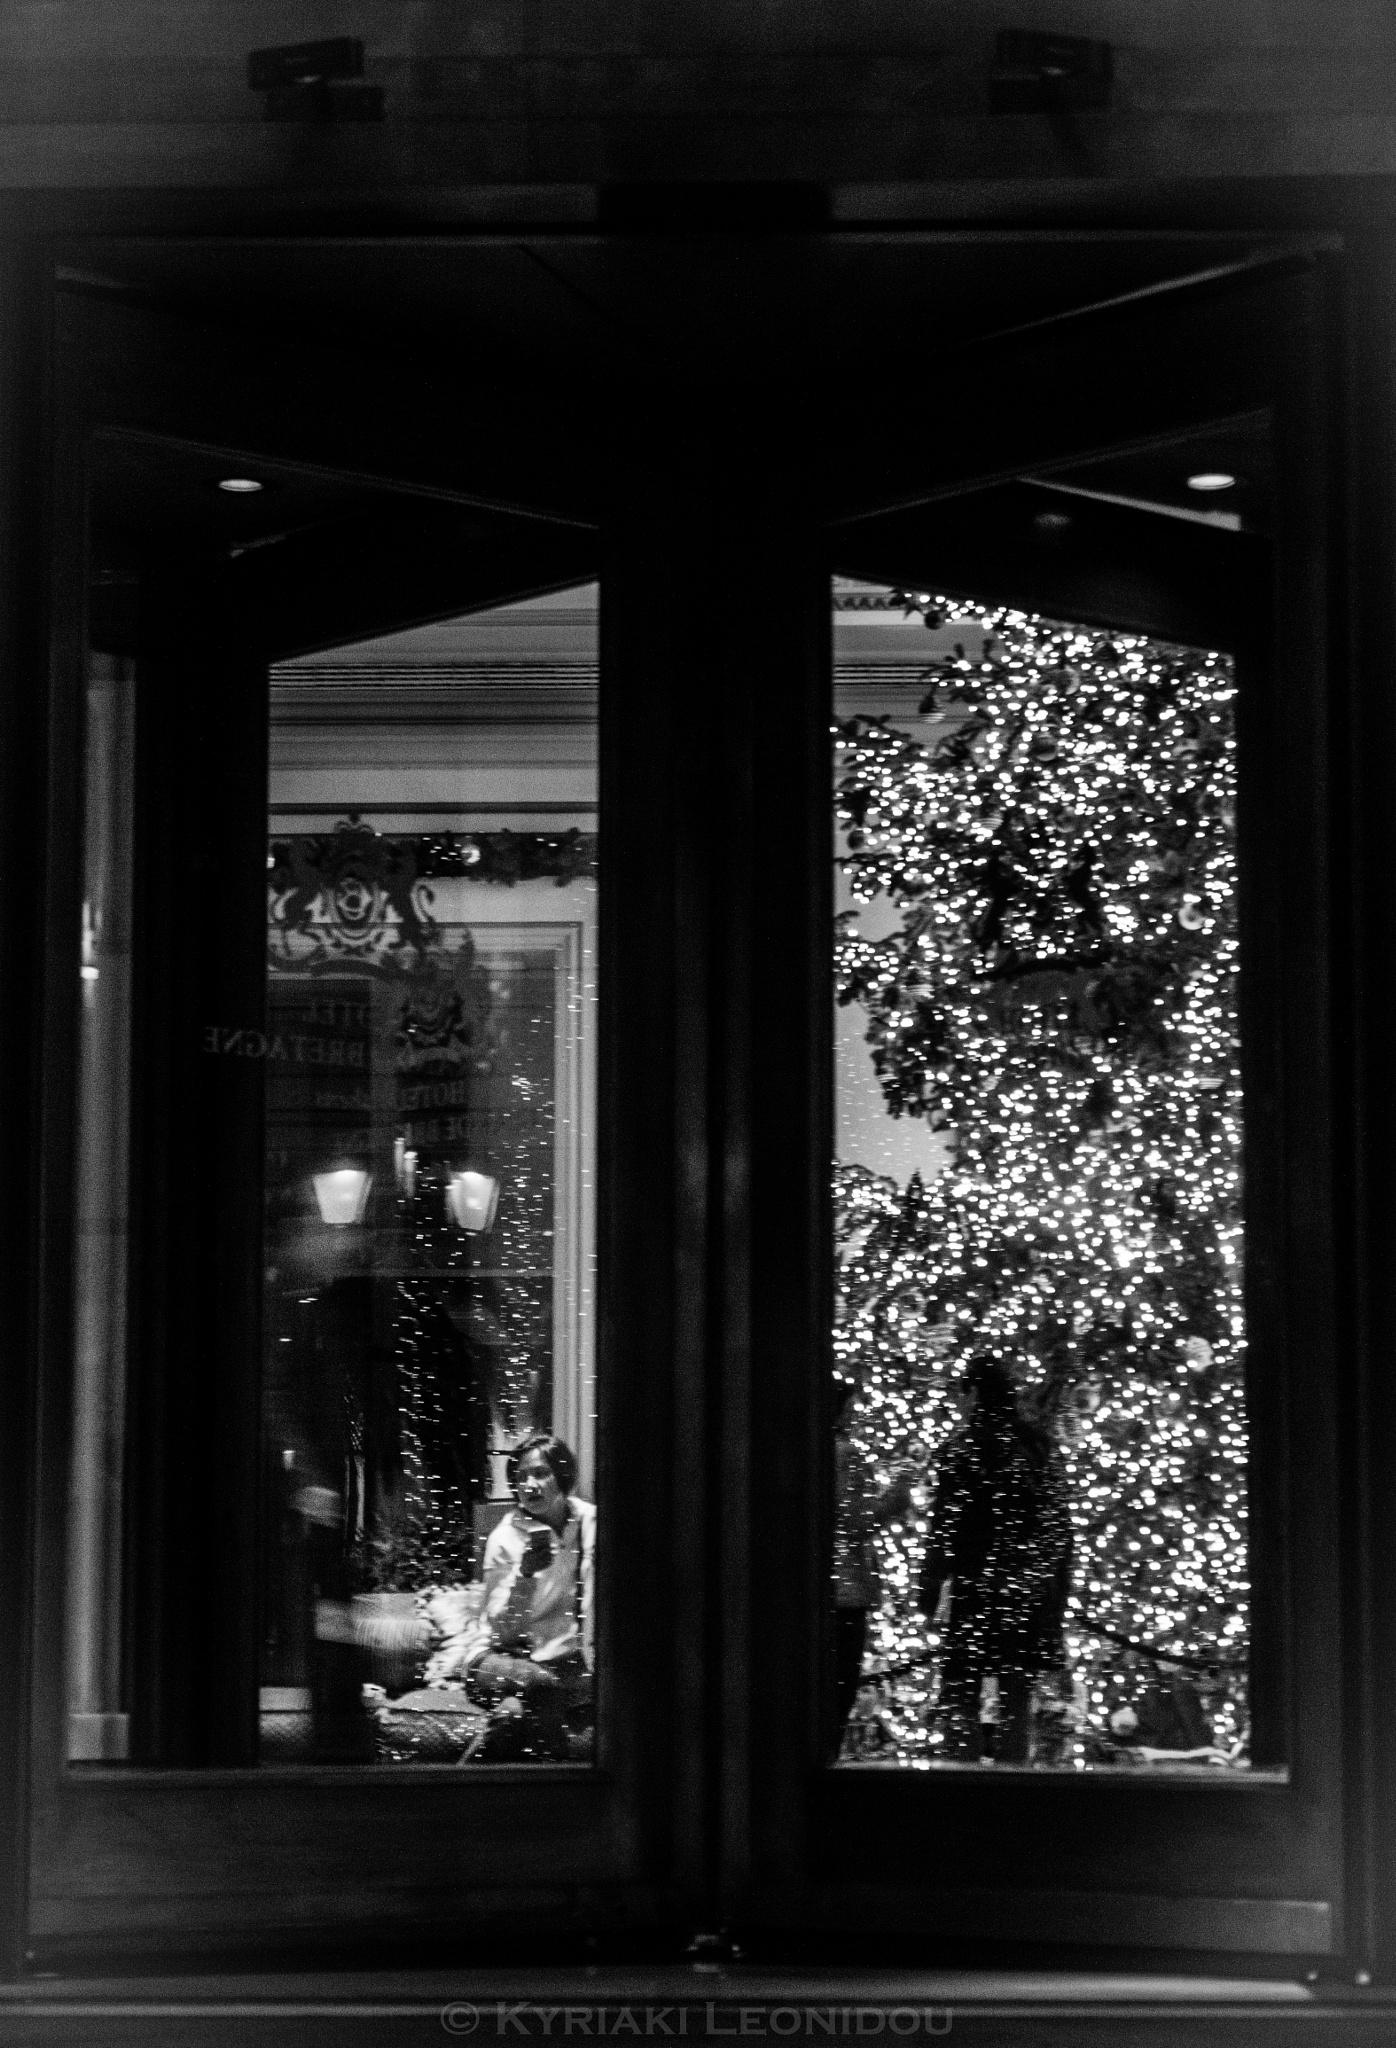 Waiting for Christmas to come by Kyriaki Leonidou